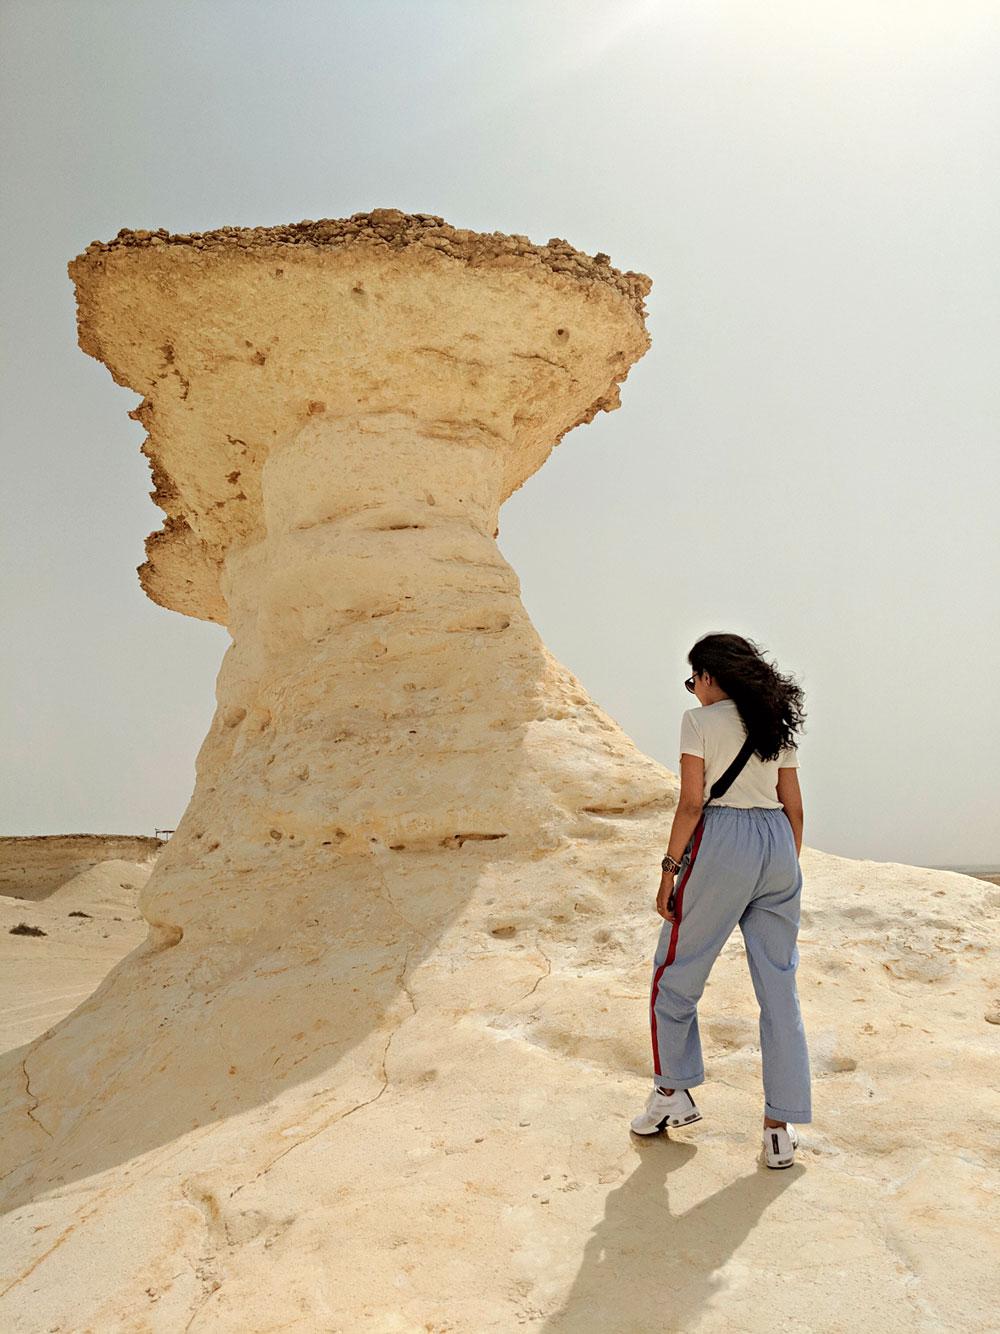 Bir Zekreet is dotted with interesting, mushroom-like, wind-sculpted limestone formations